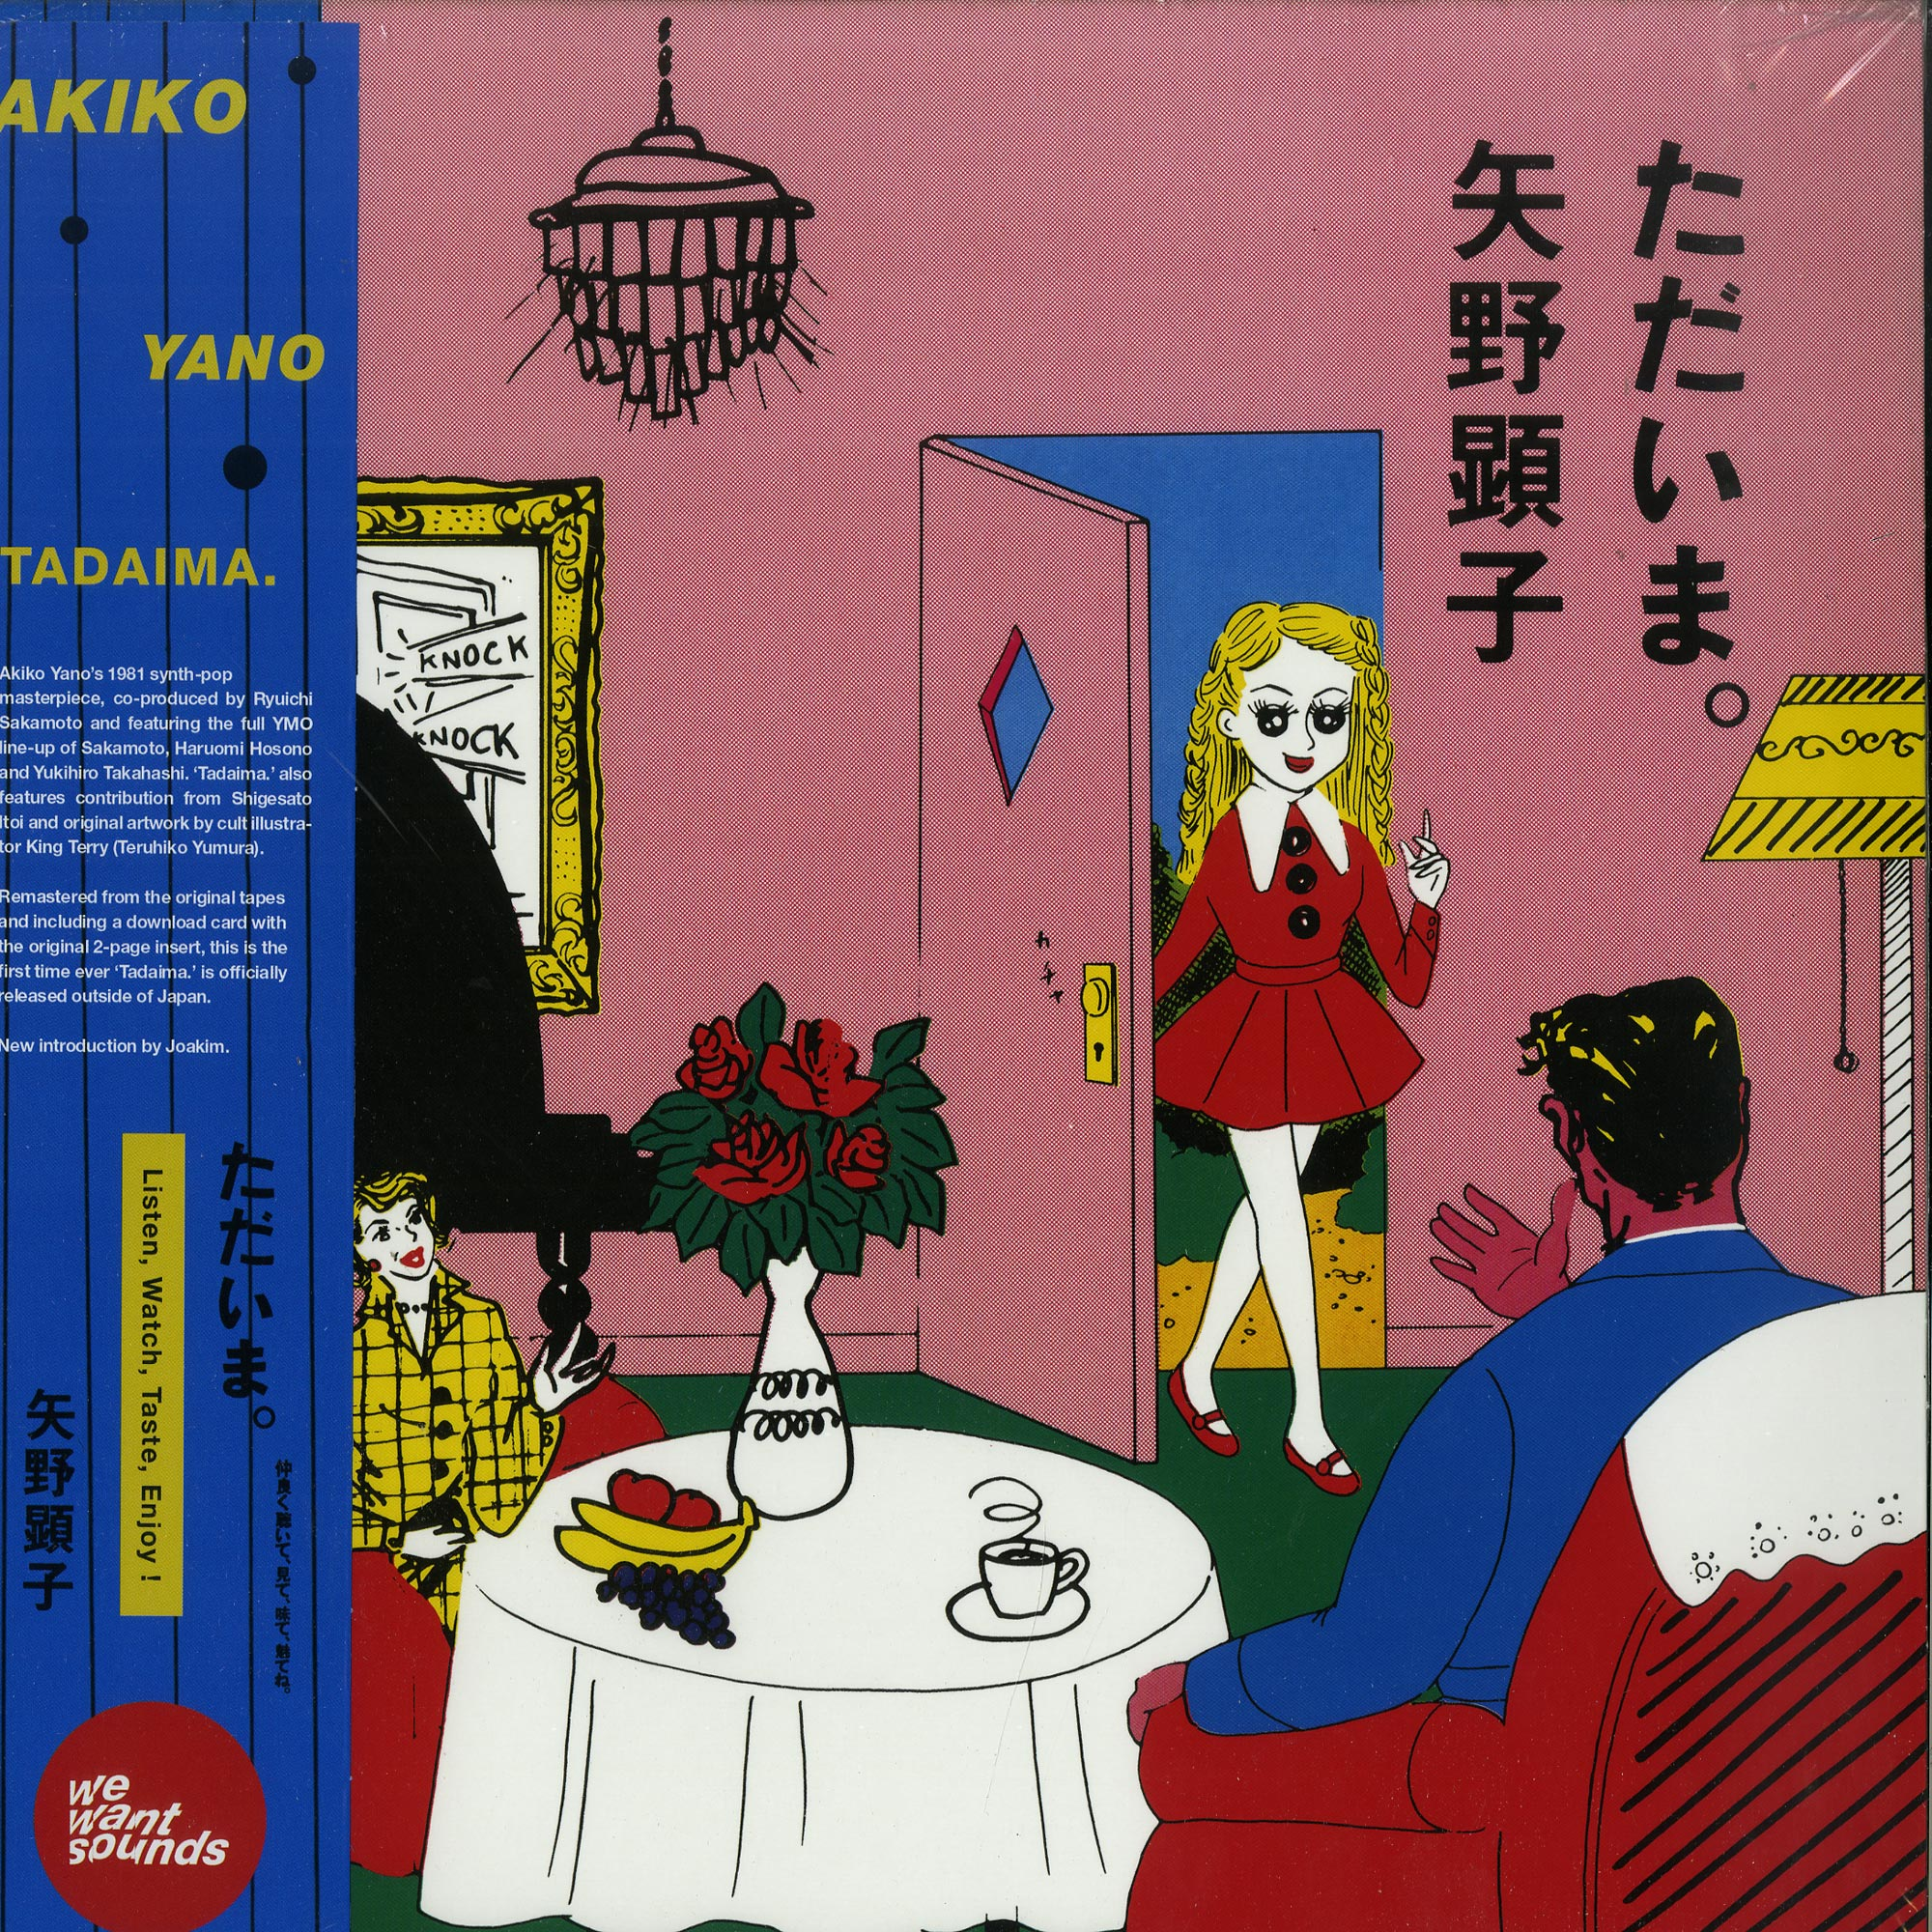 Akiko Yano - TADAIMA.